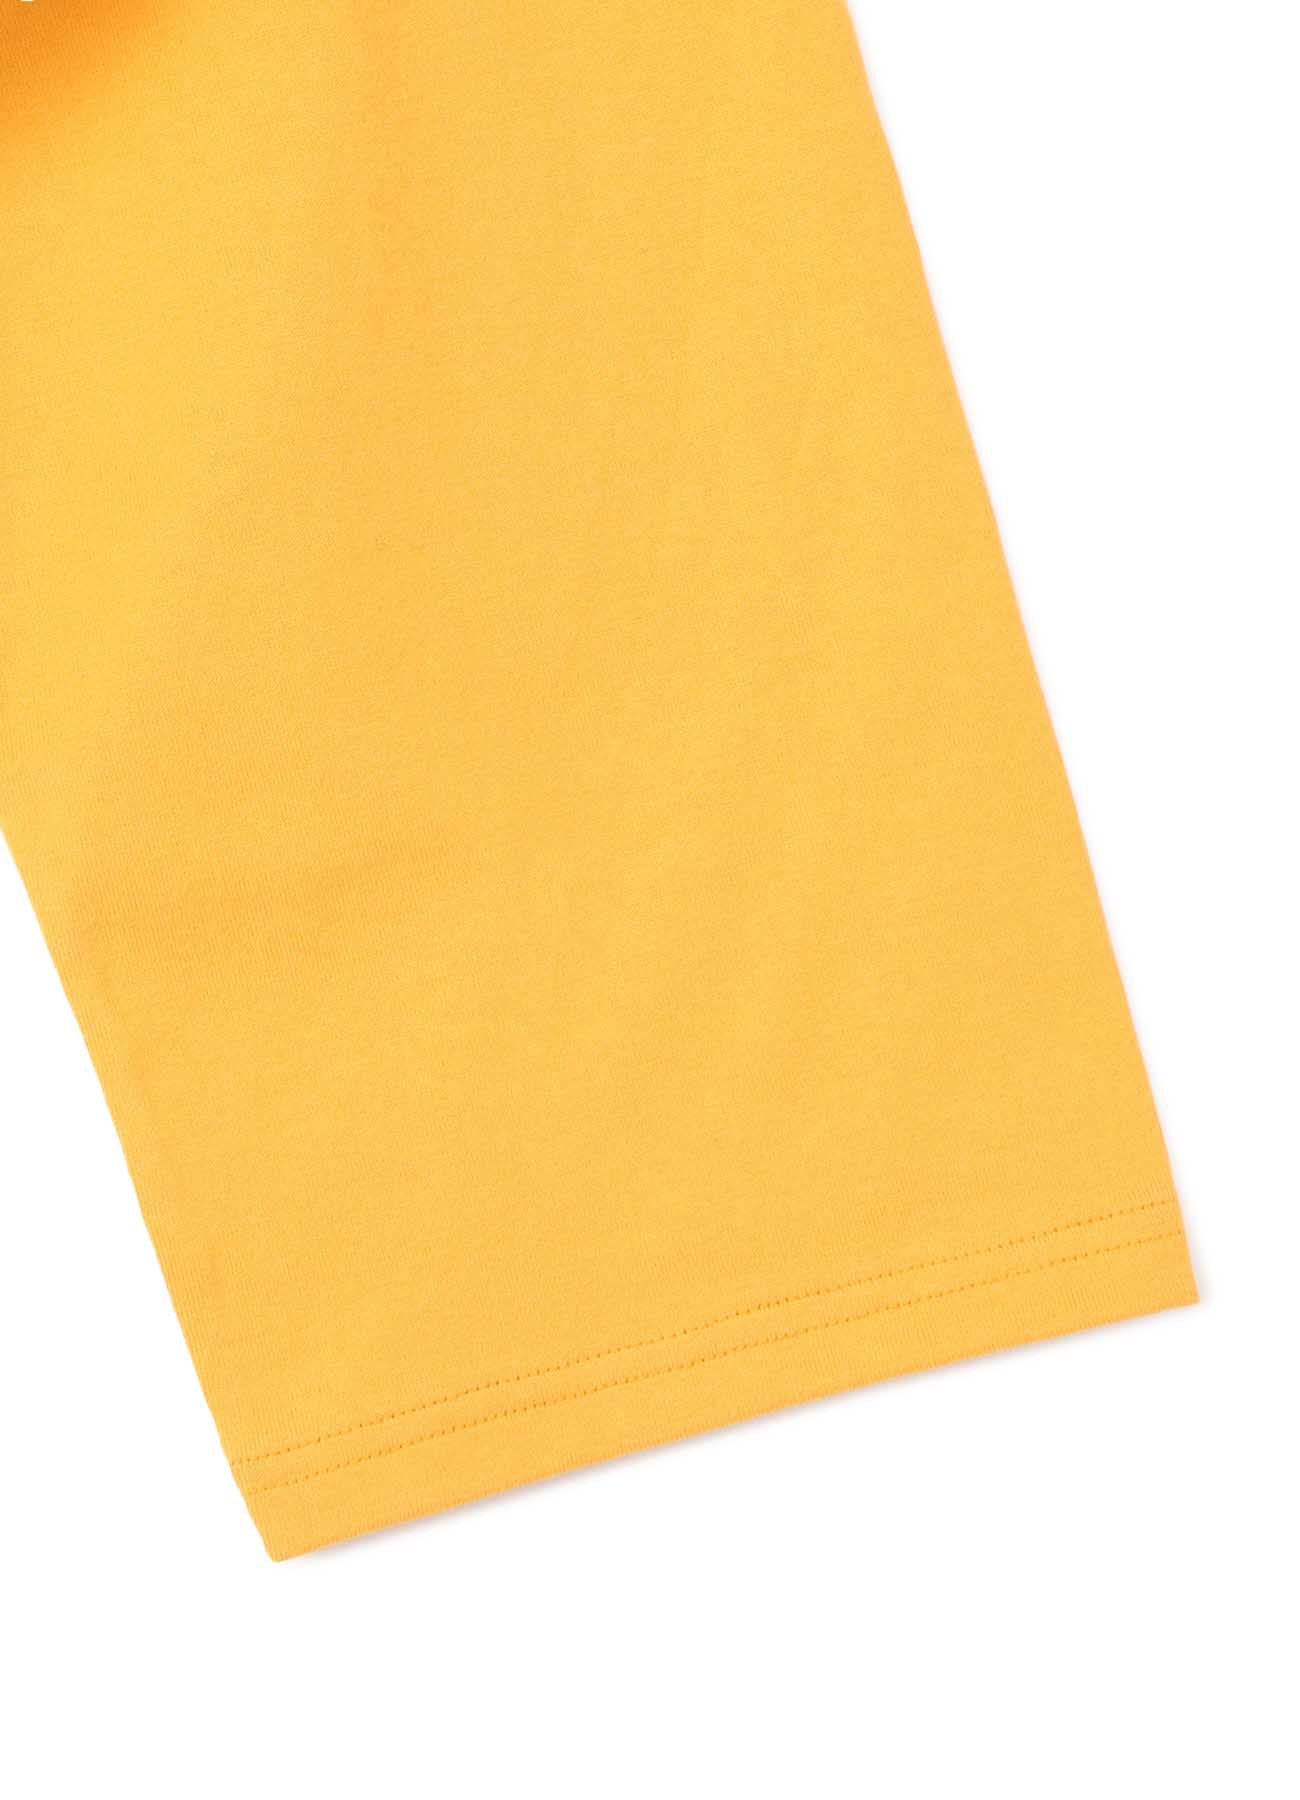 Tight Tension Plain Stitch Sleeve Zip T